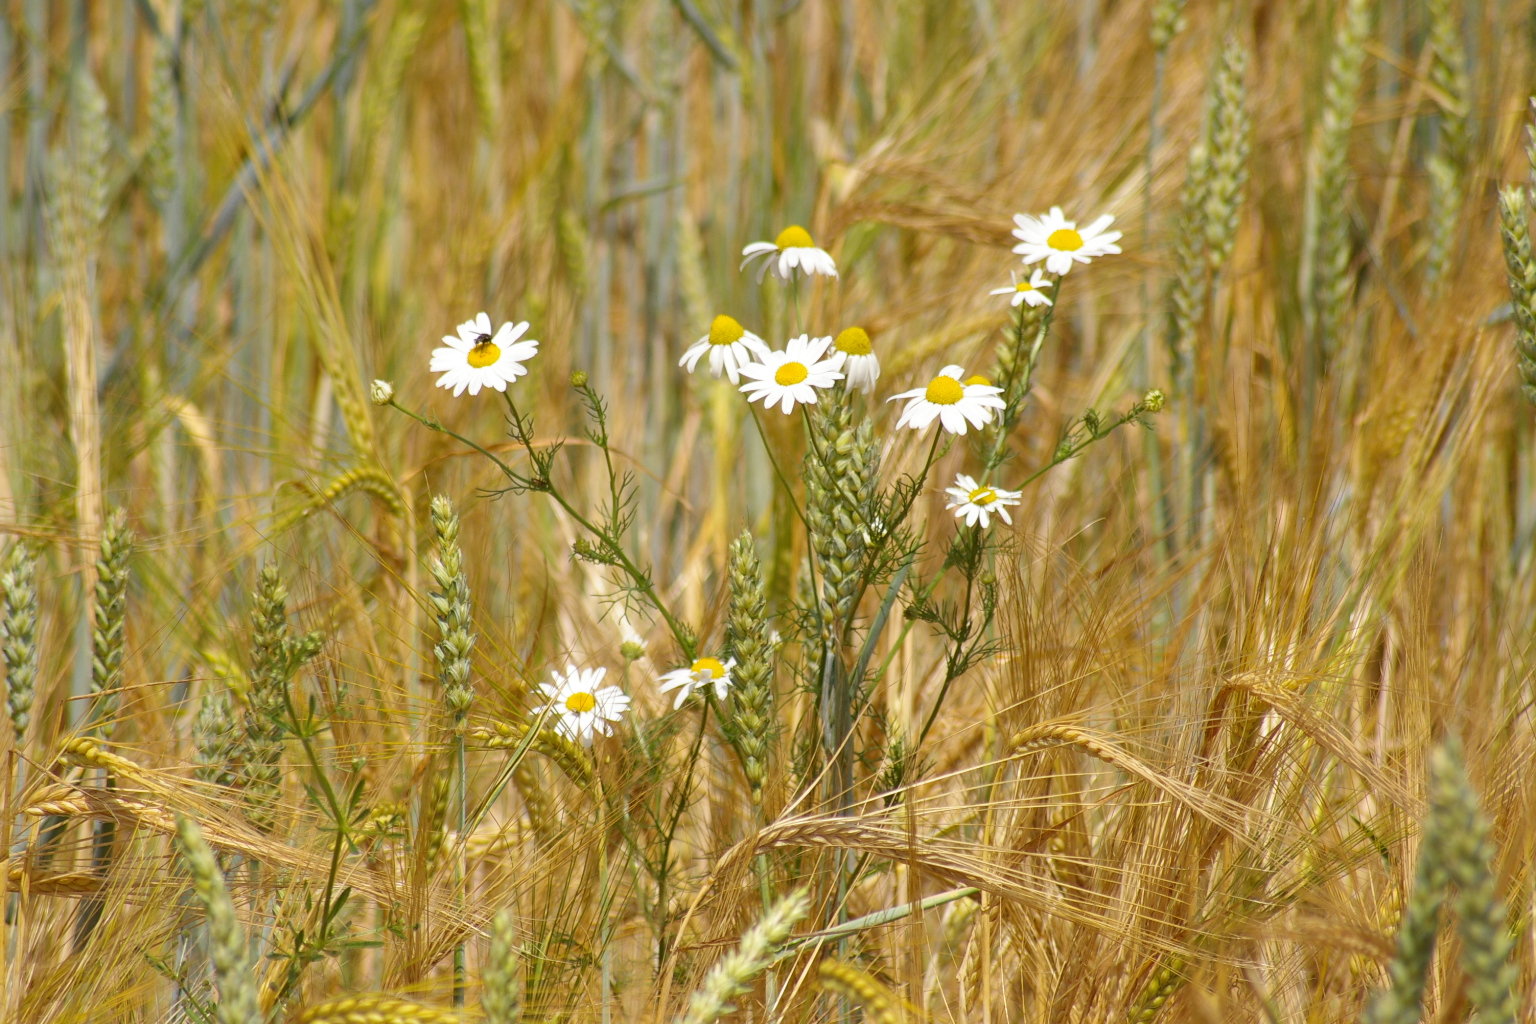 Kein Bett, sondern Blumen im Kornfeld